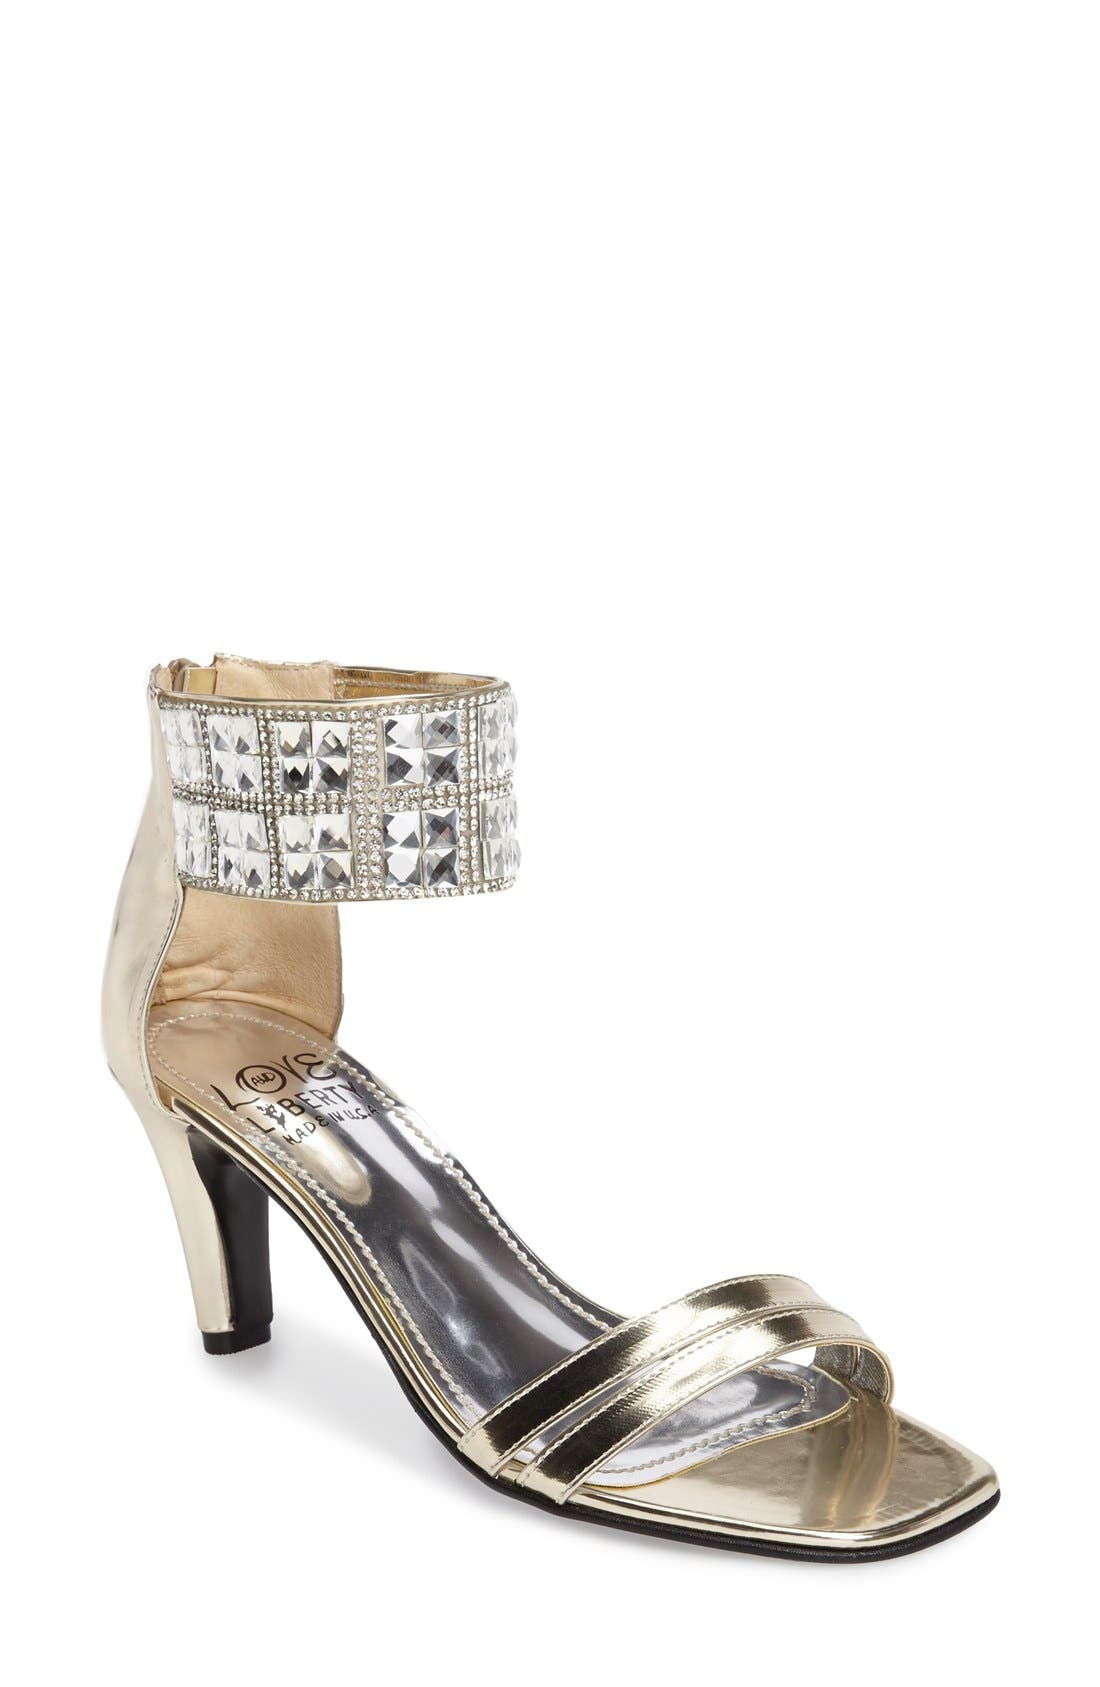 Scarlett Crystal Embellished Evening Sandal,                             Main thumbnail 1, color,                             PLATINUM FAUX LEATHER